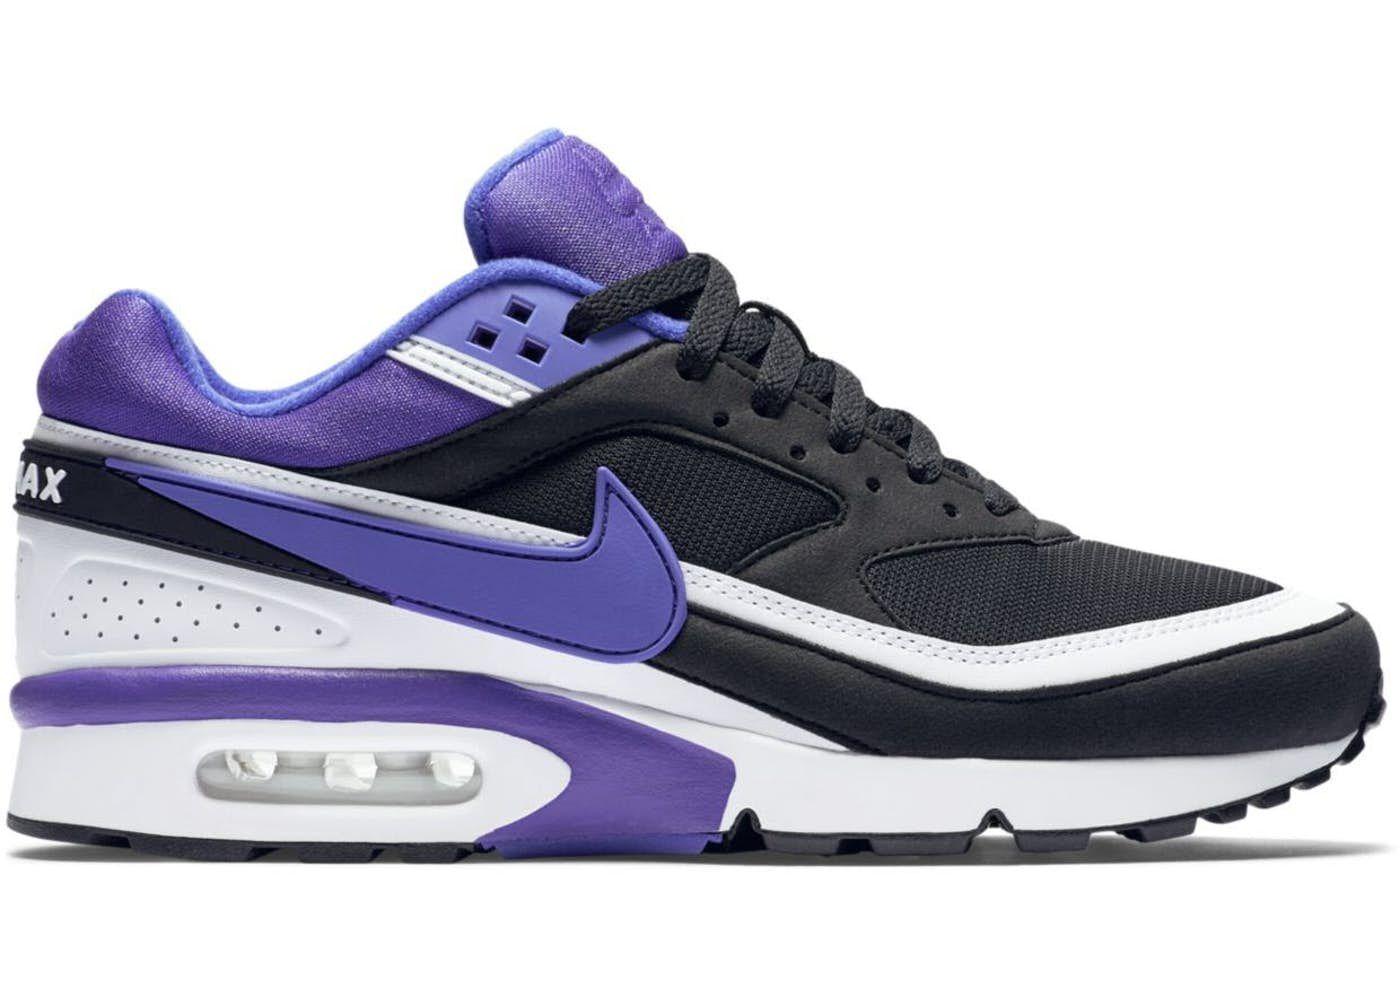 Nike Air Max BW Persian Violet (2016